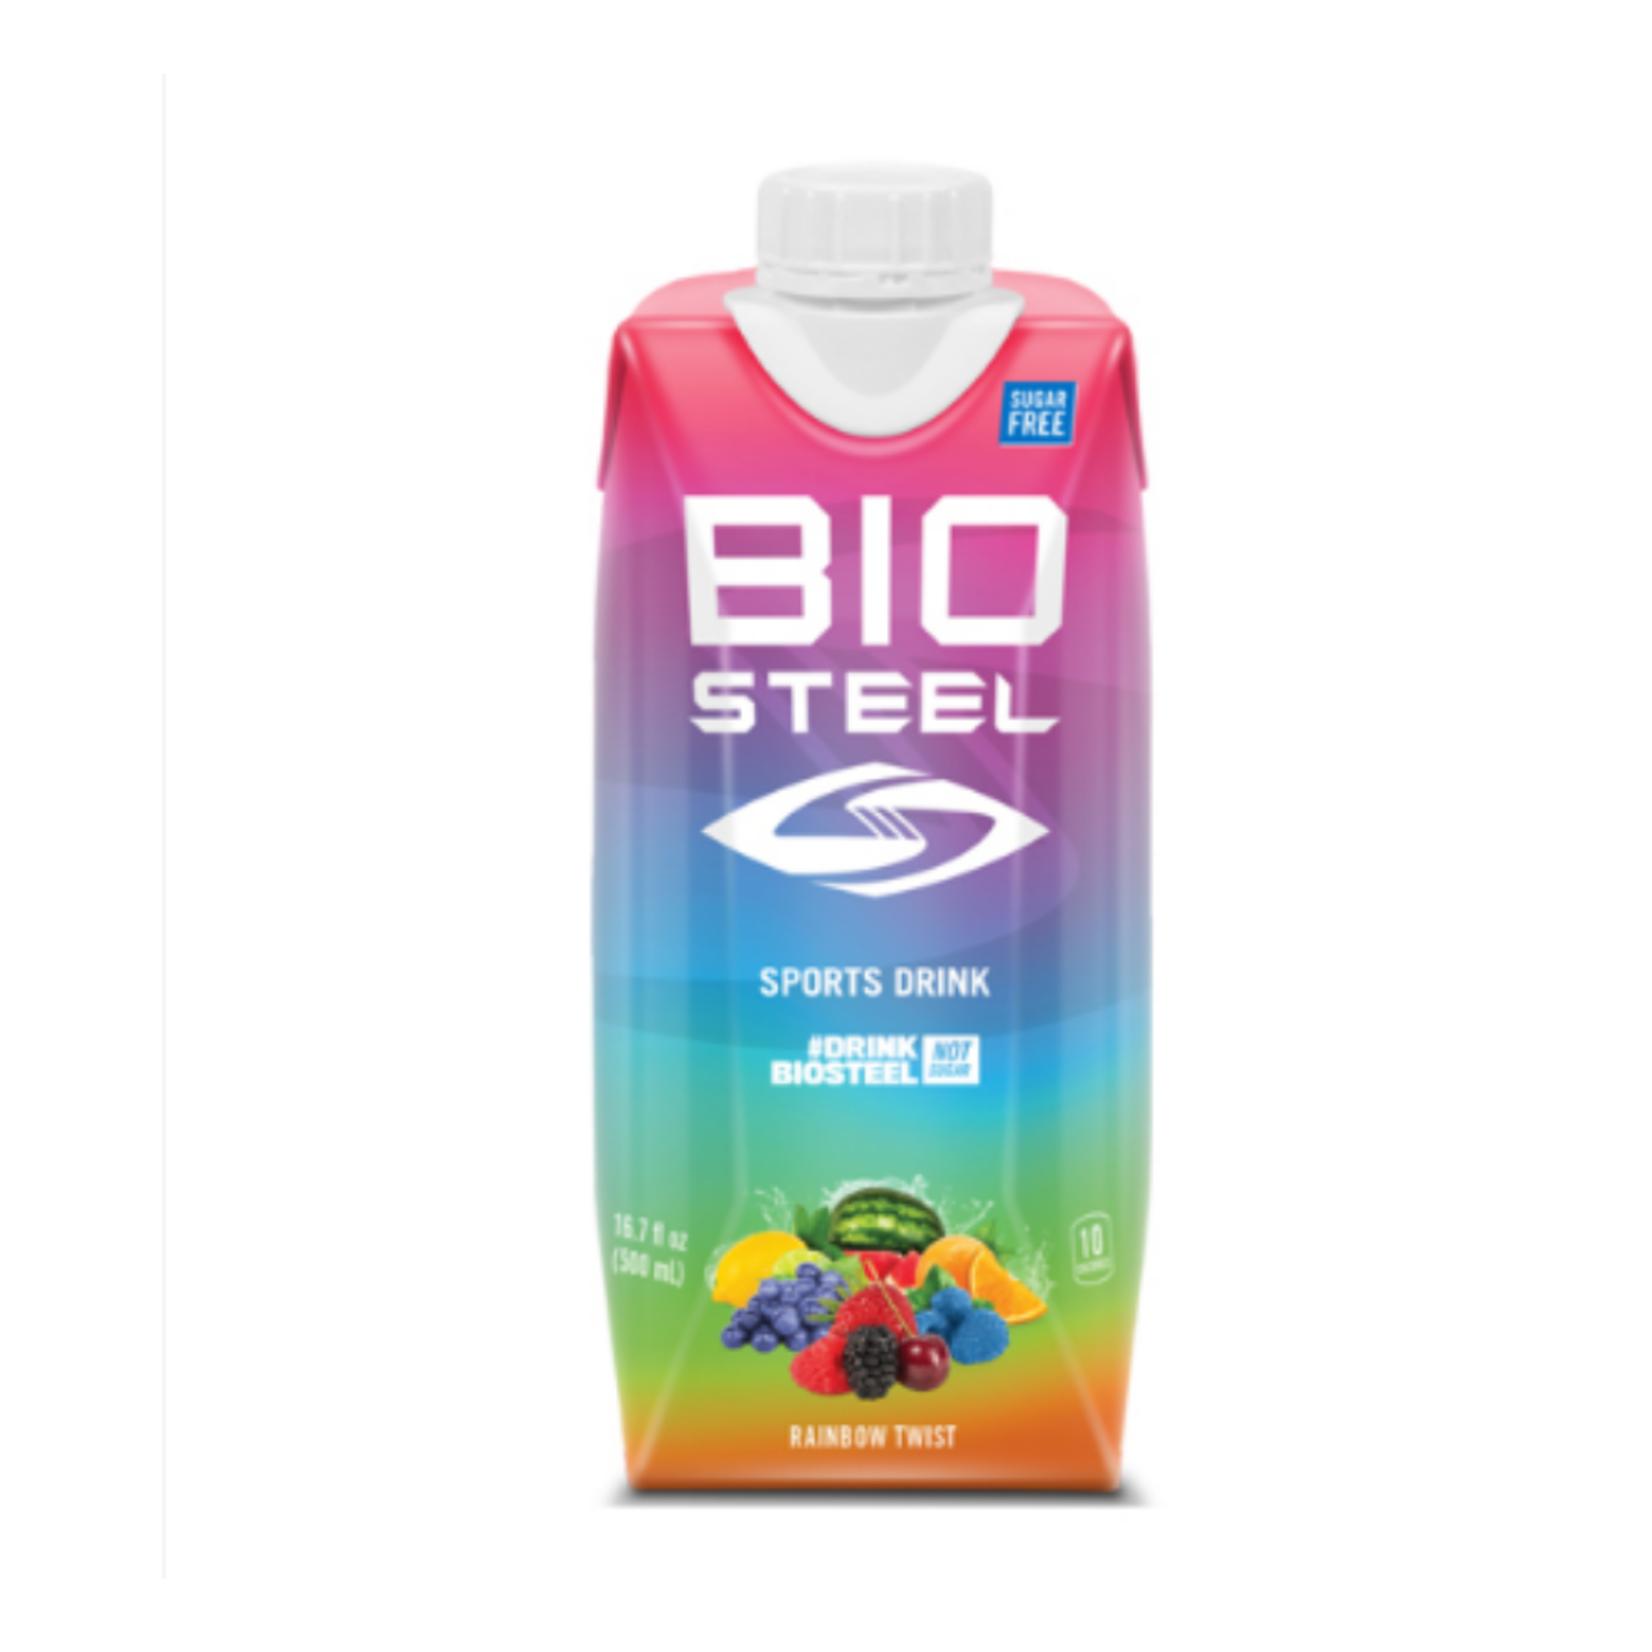 Biosteel Hydration Mix Ready-to-drink Tetra Pak - Individual